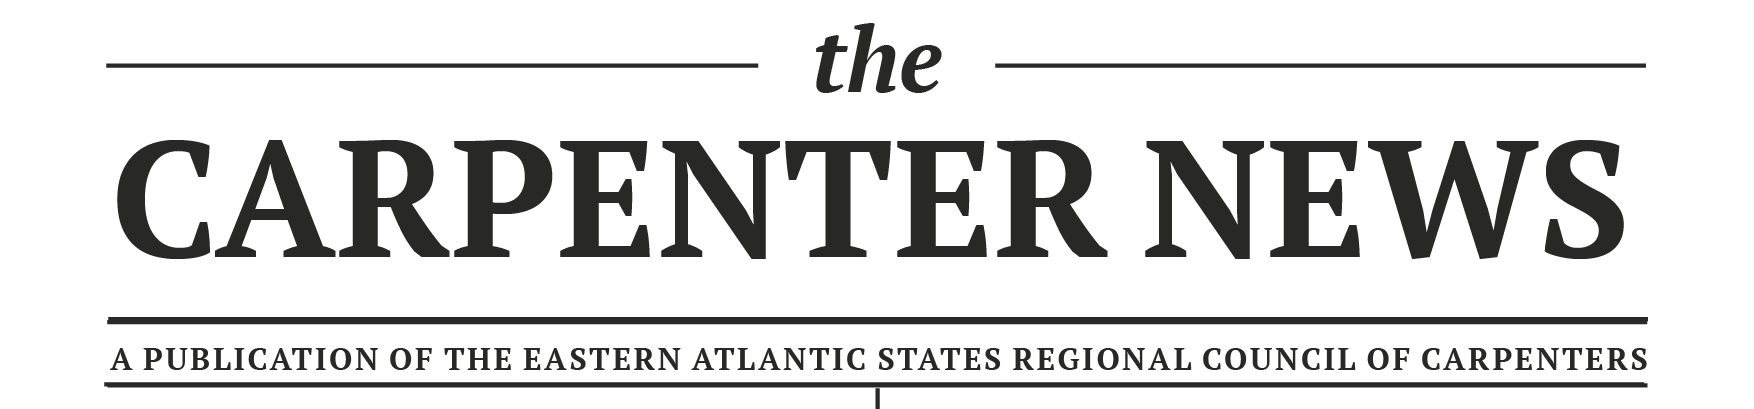 The Carpenter News Summer 2021 Edition